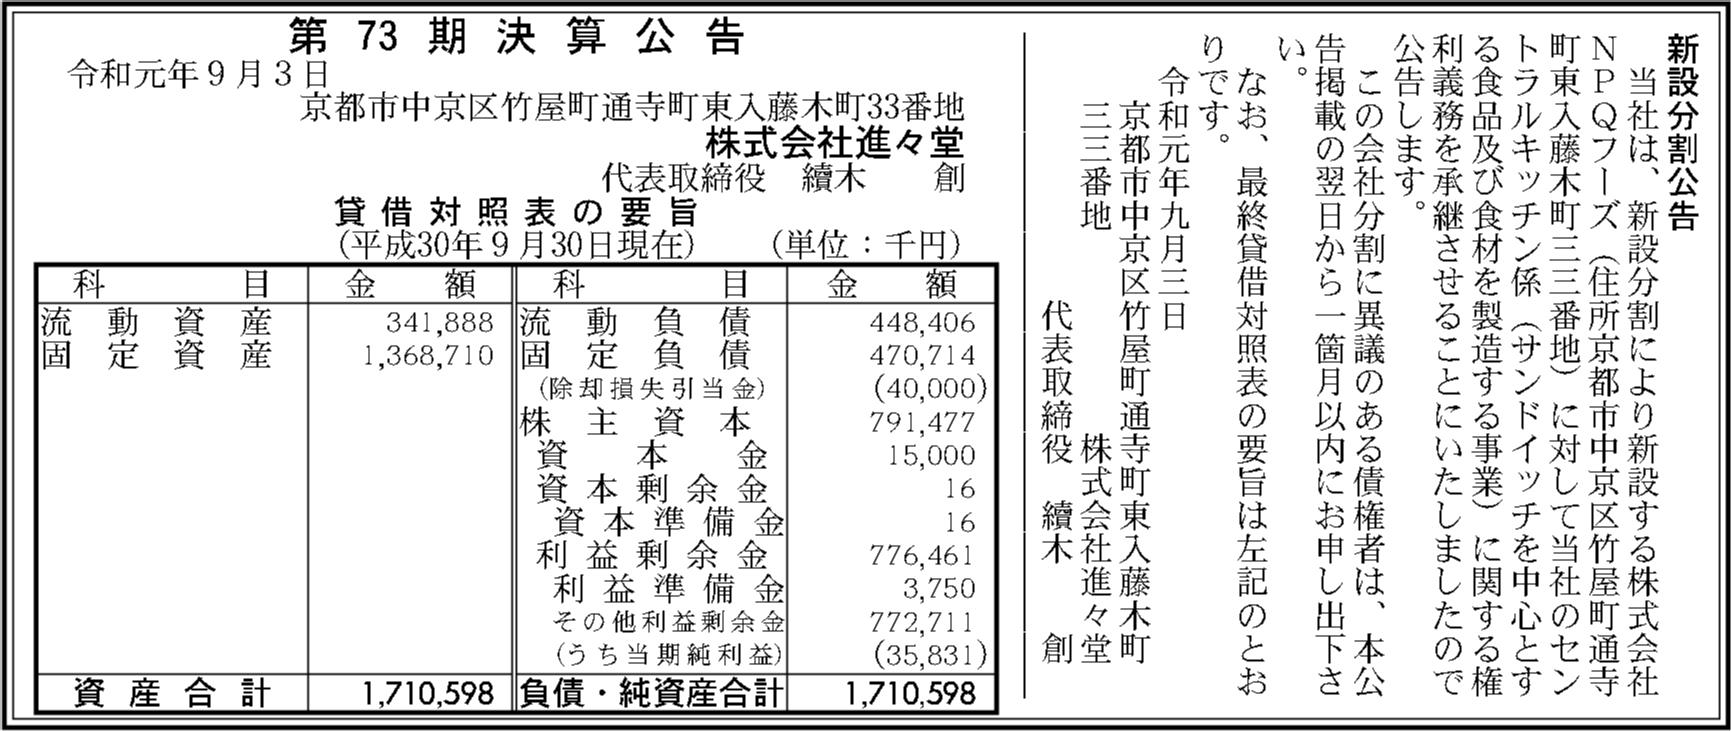 0055 934809fea5f0995c39fb2c3d8422233fdafffef4a26807ccbddde01597e53f240dfa67d201e837701742d89052c9be6eb122ab868220f6dfda53b103a09e63a7 04